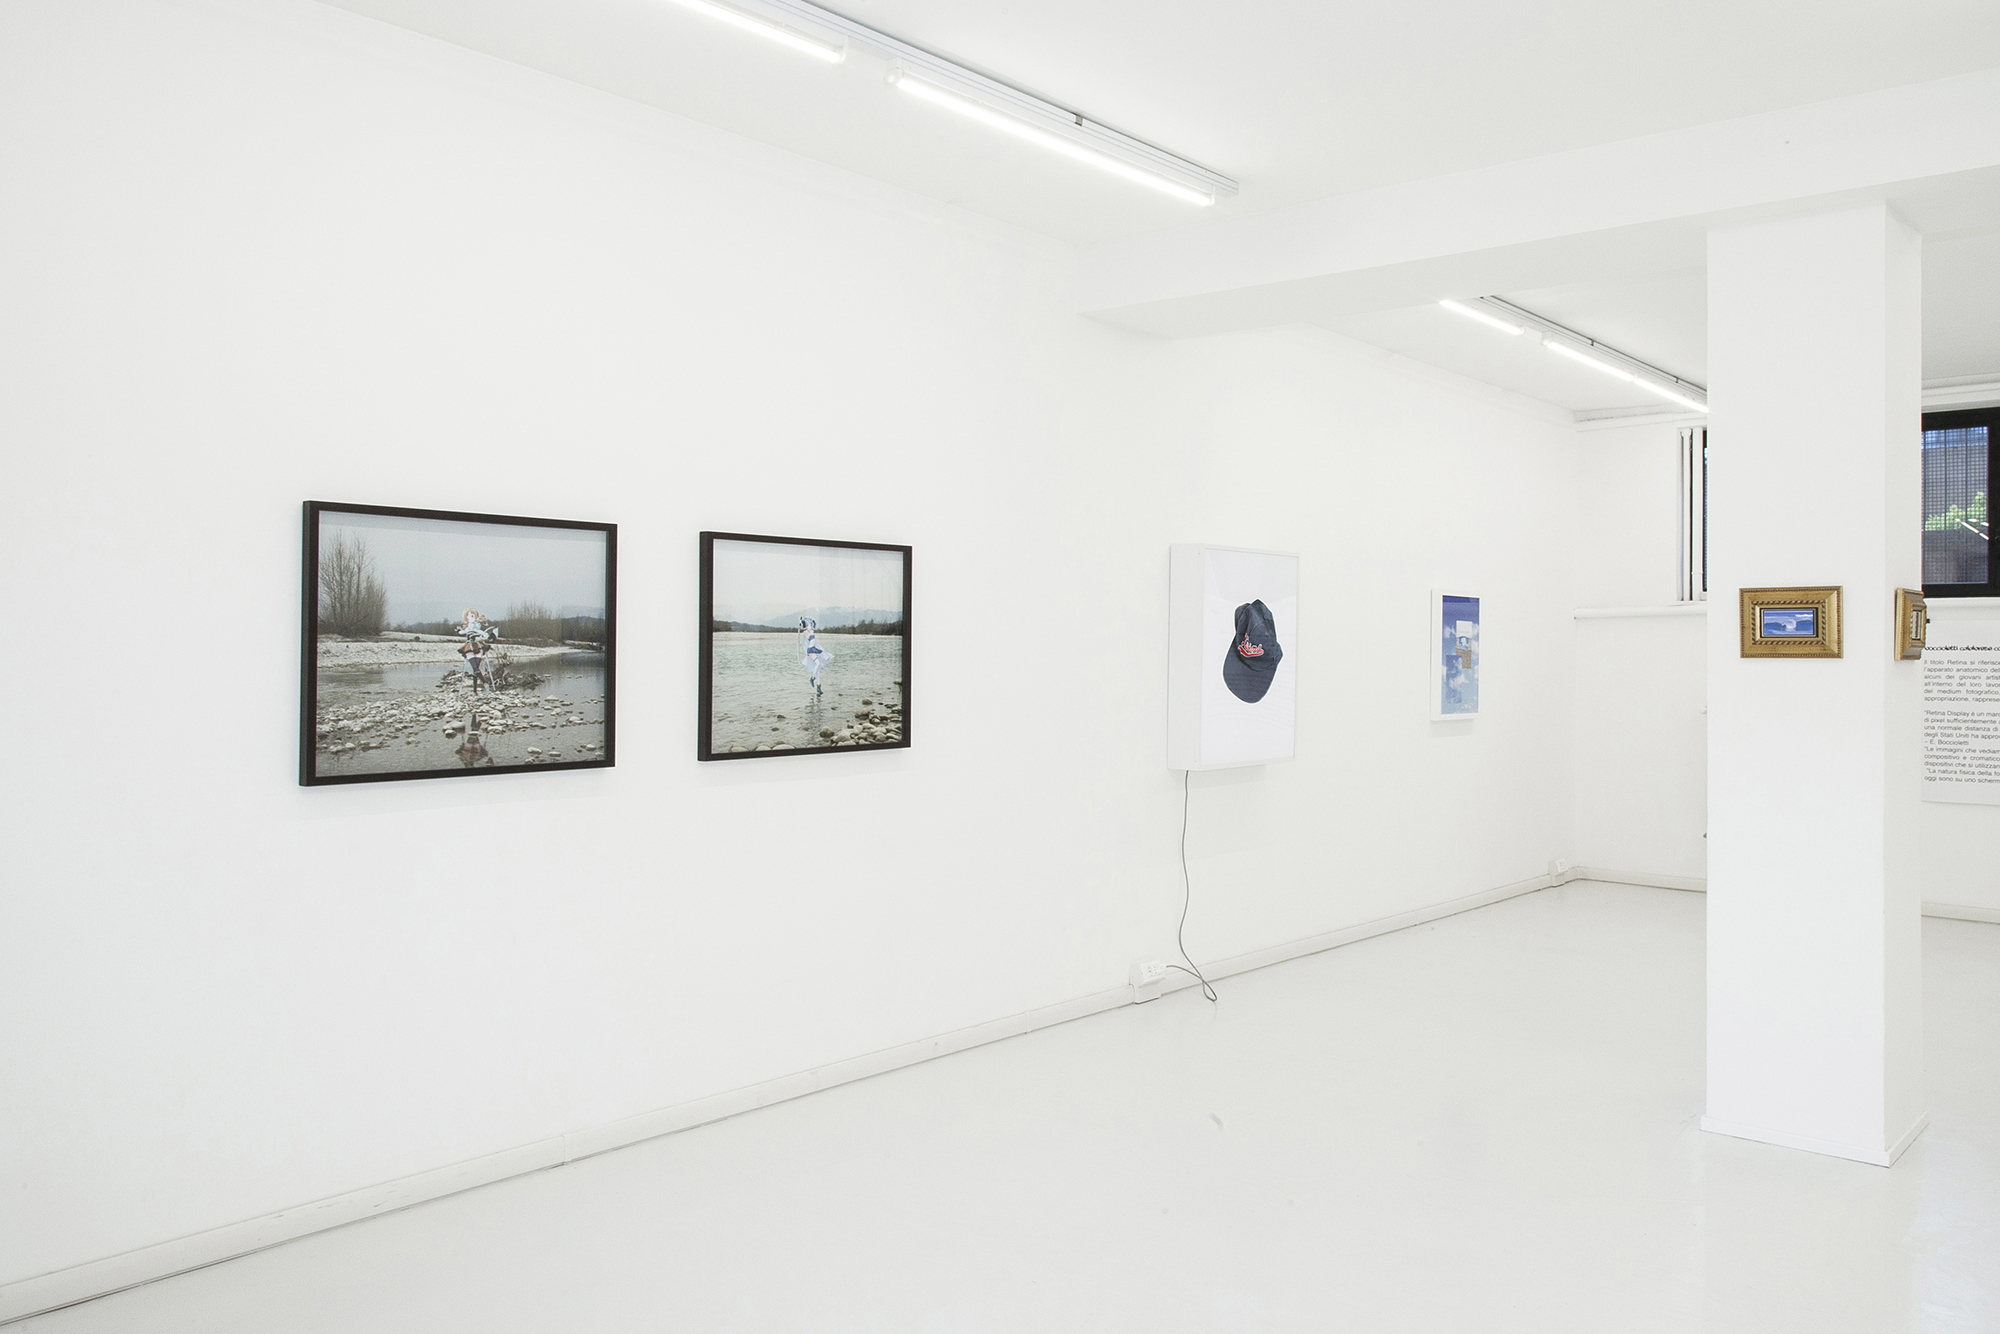 – RETINA Installation Views @ Gluqbar: da sinistra a destra Rachele Maistrello, Luca Massaro, Filippo Minelli, Martina Corà